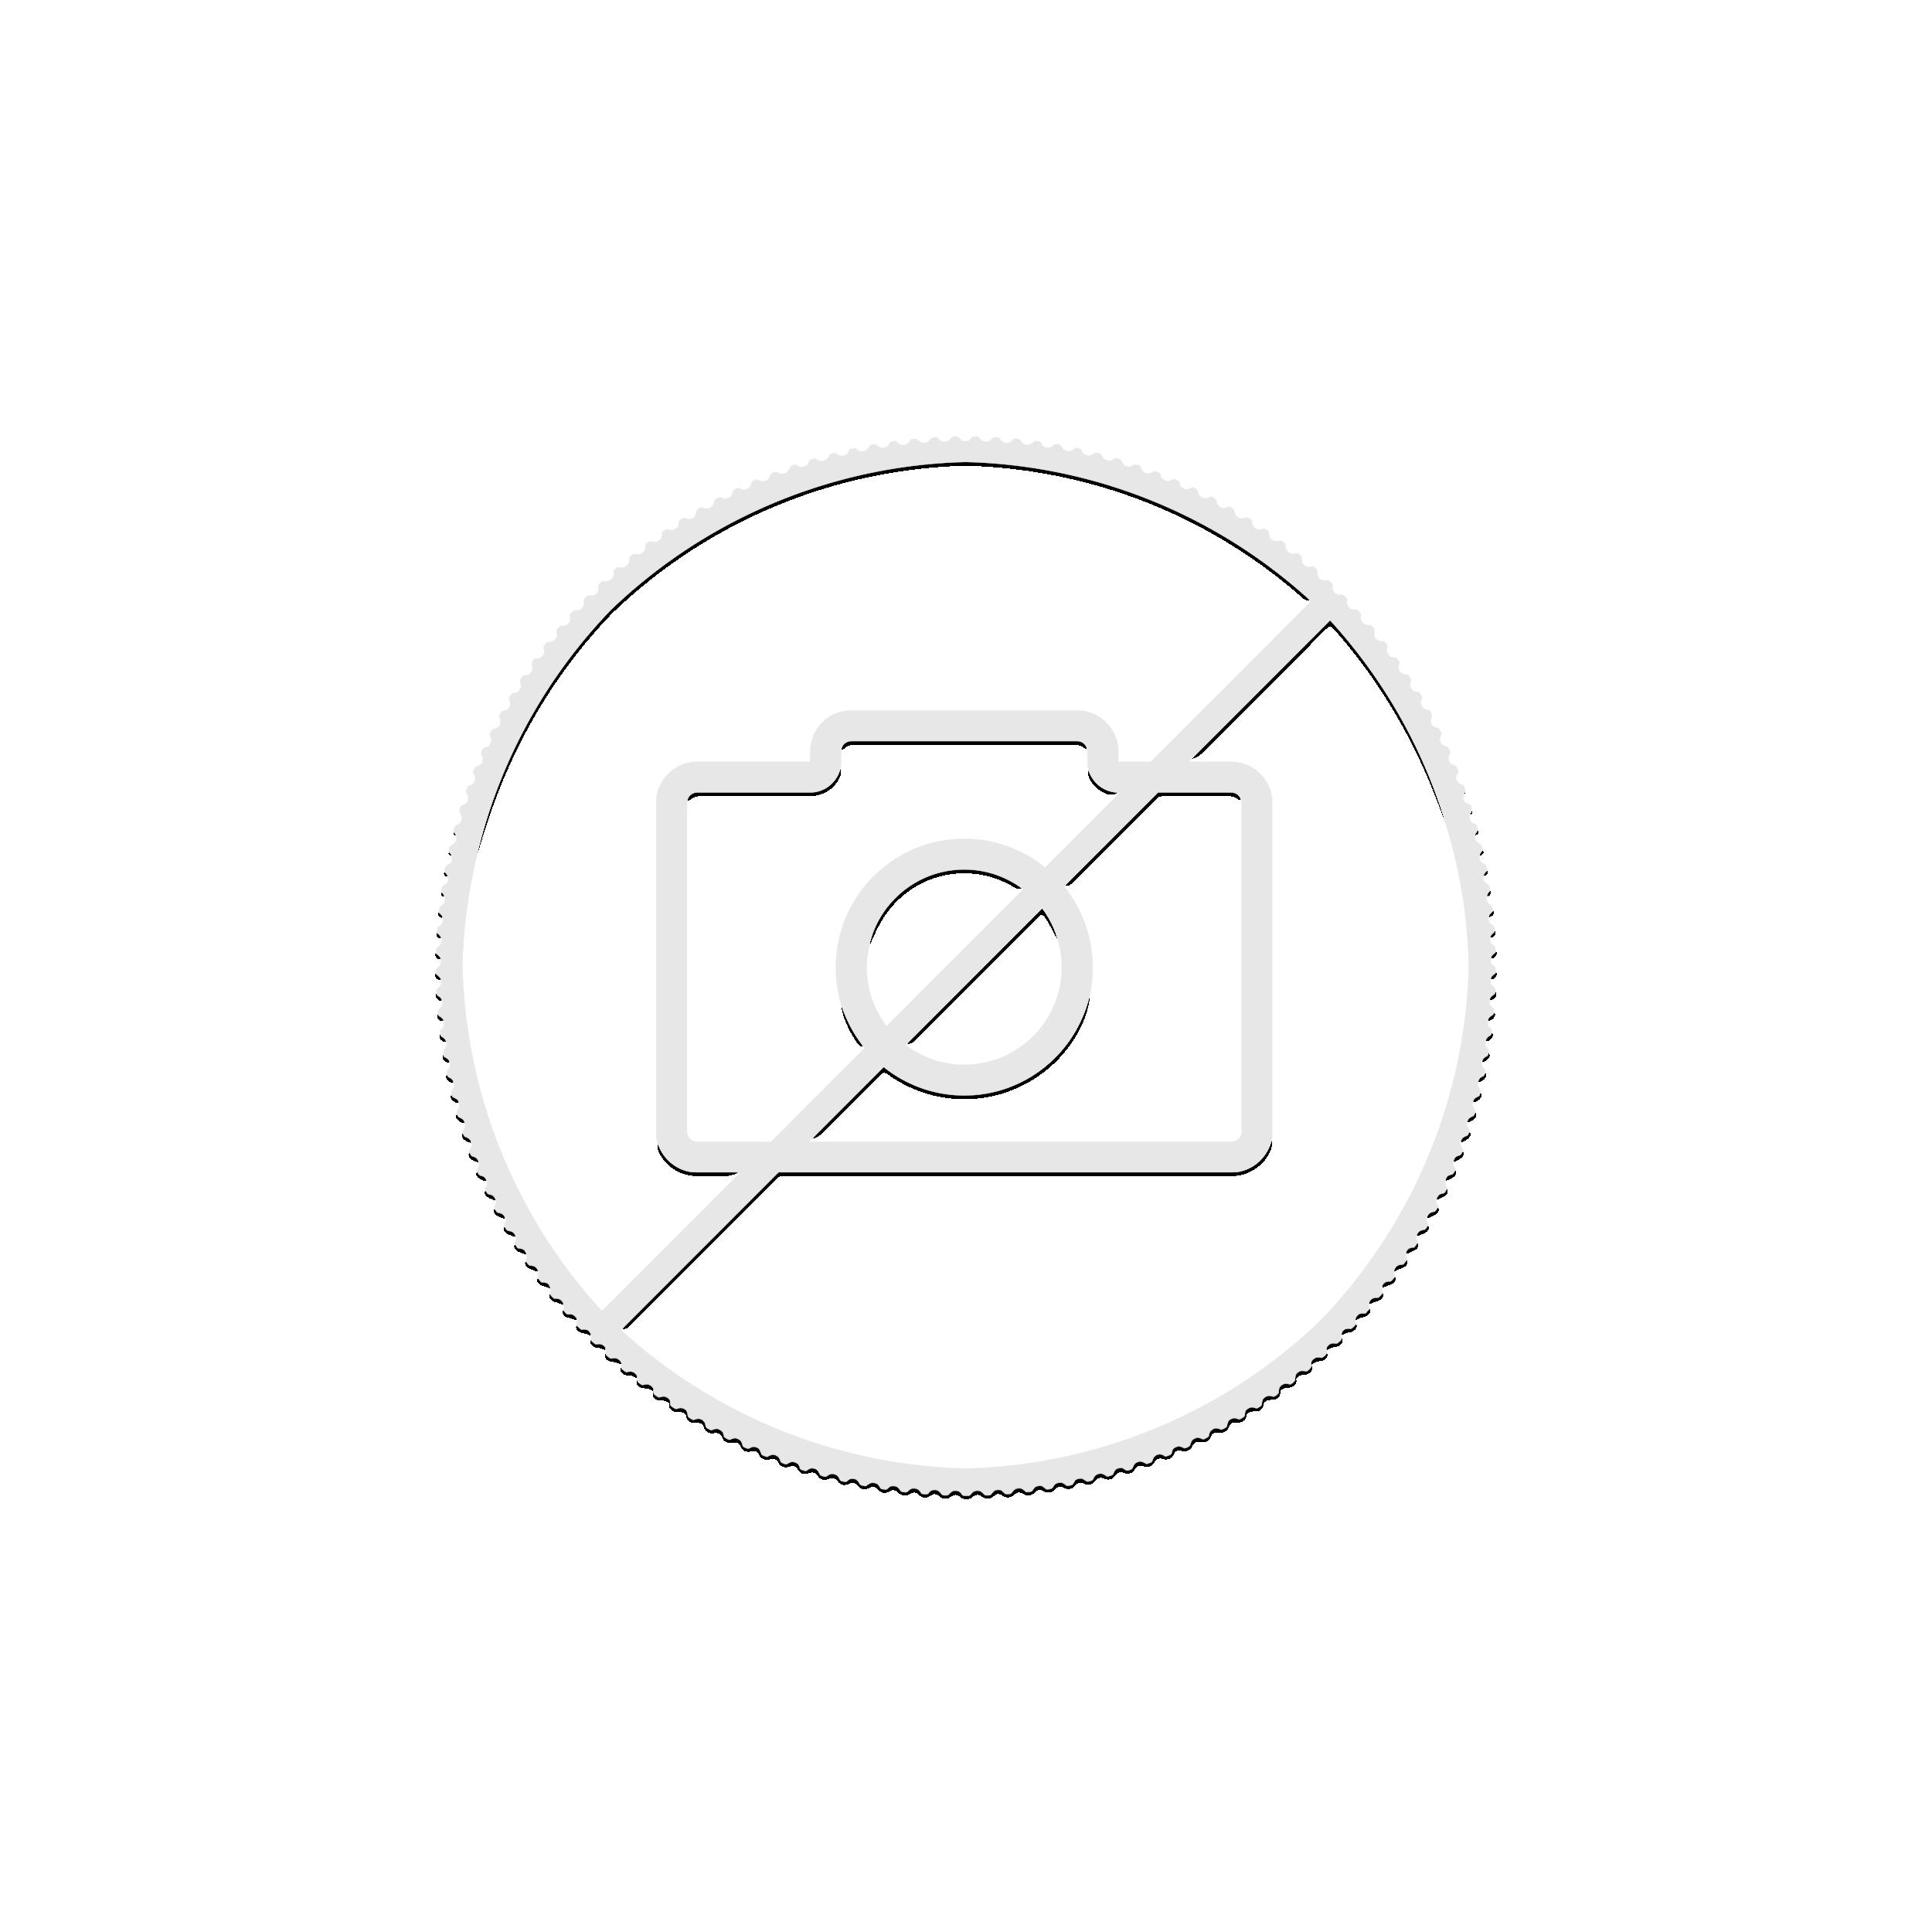 1 troy ounce zilveren munt dragon gekleurd 2021 - achterkant